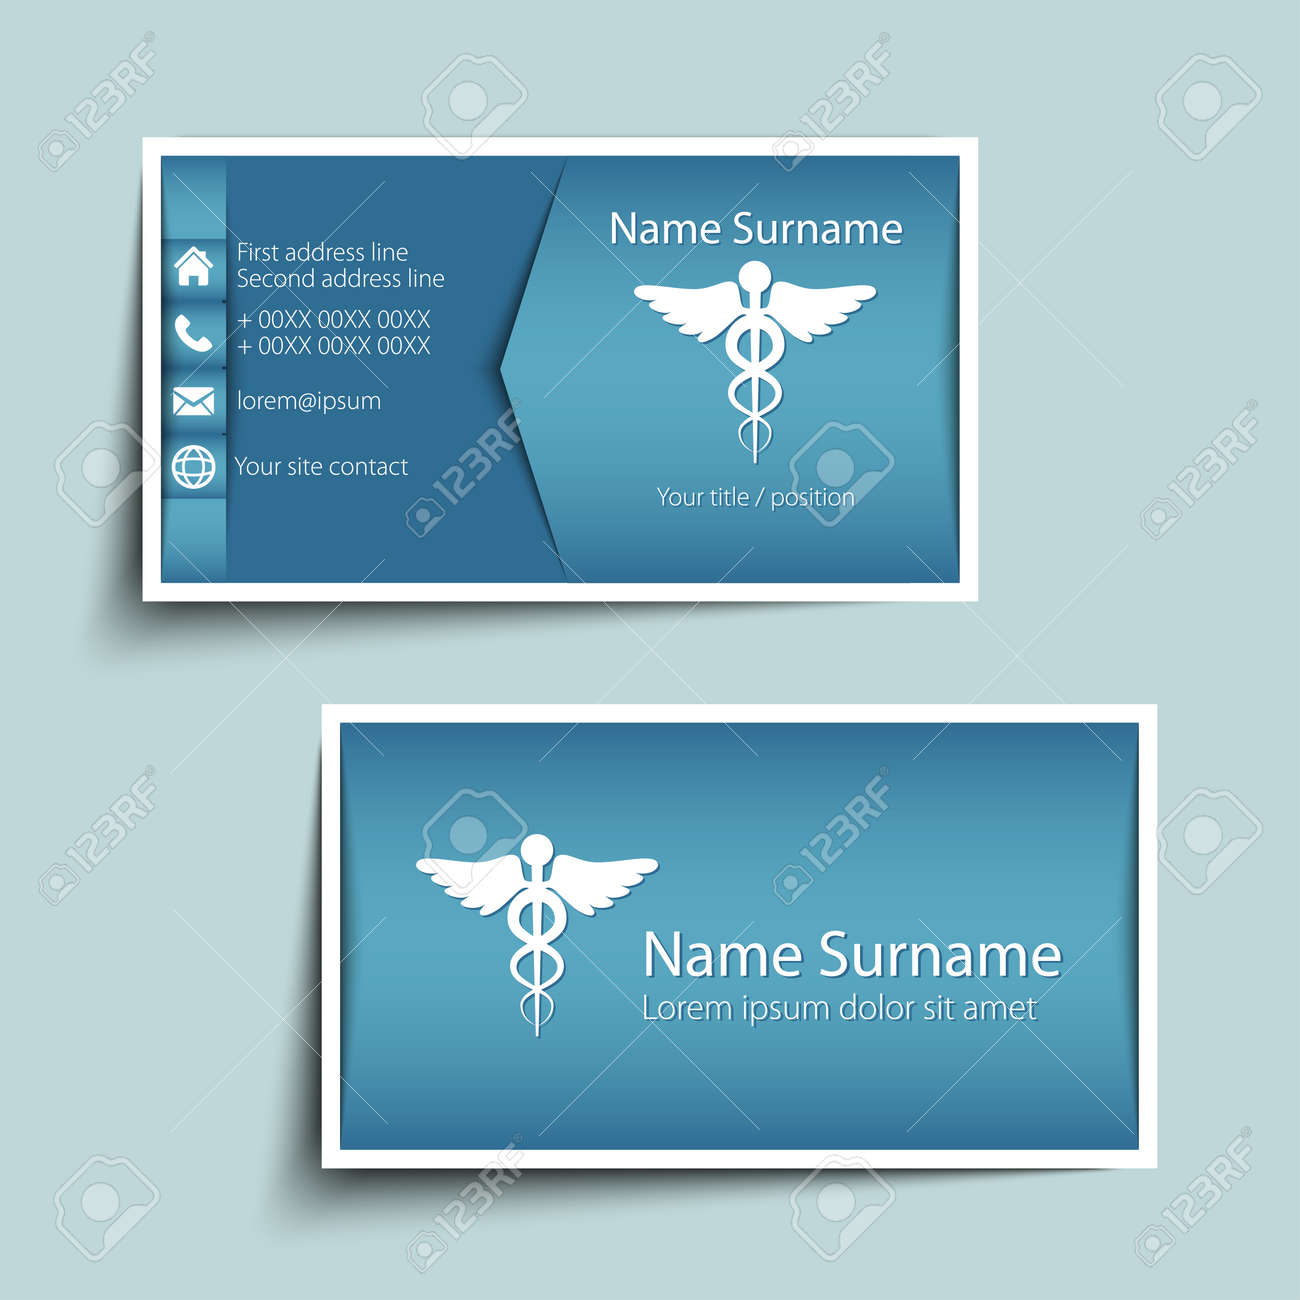 Modern simple business card template royalty free cliparts vectors modern simple business card template stock vector 32510984 fbccfo Choice Image